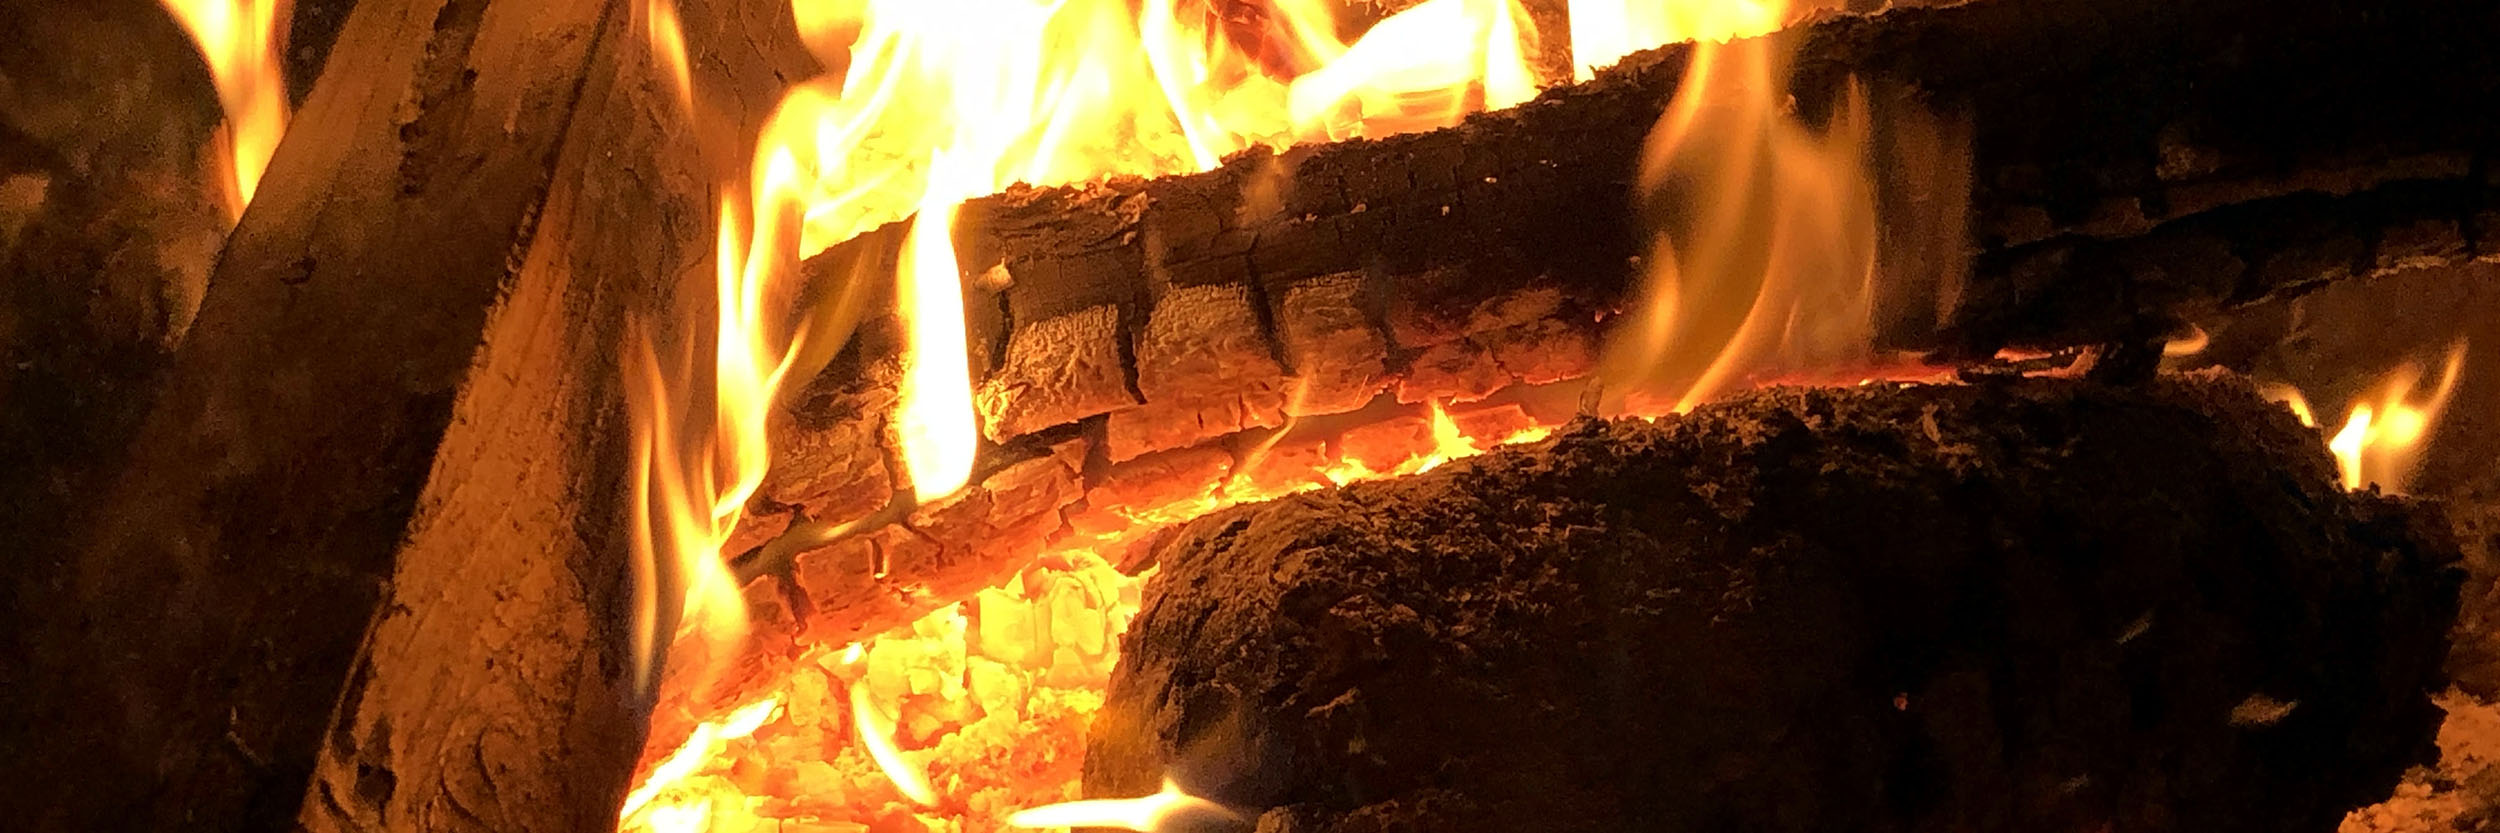 A fire burning wood